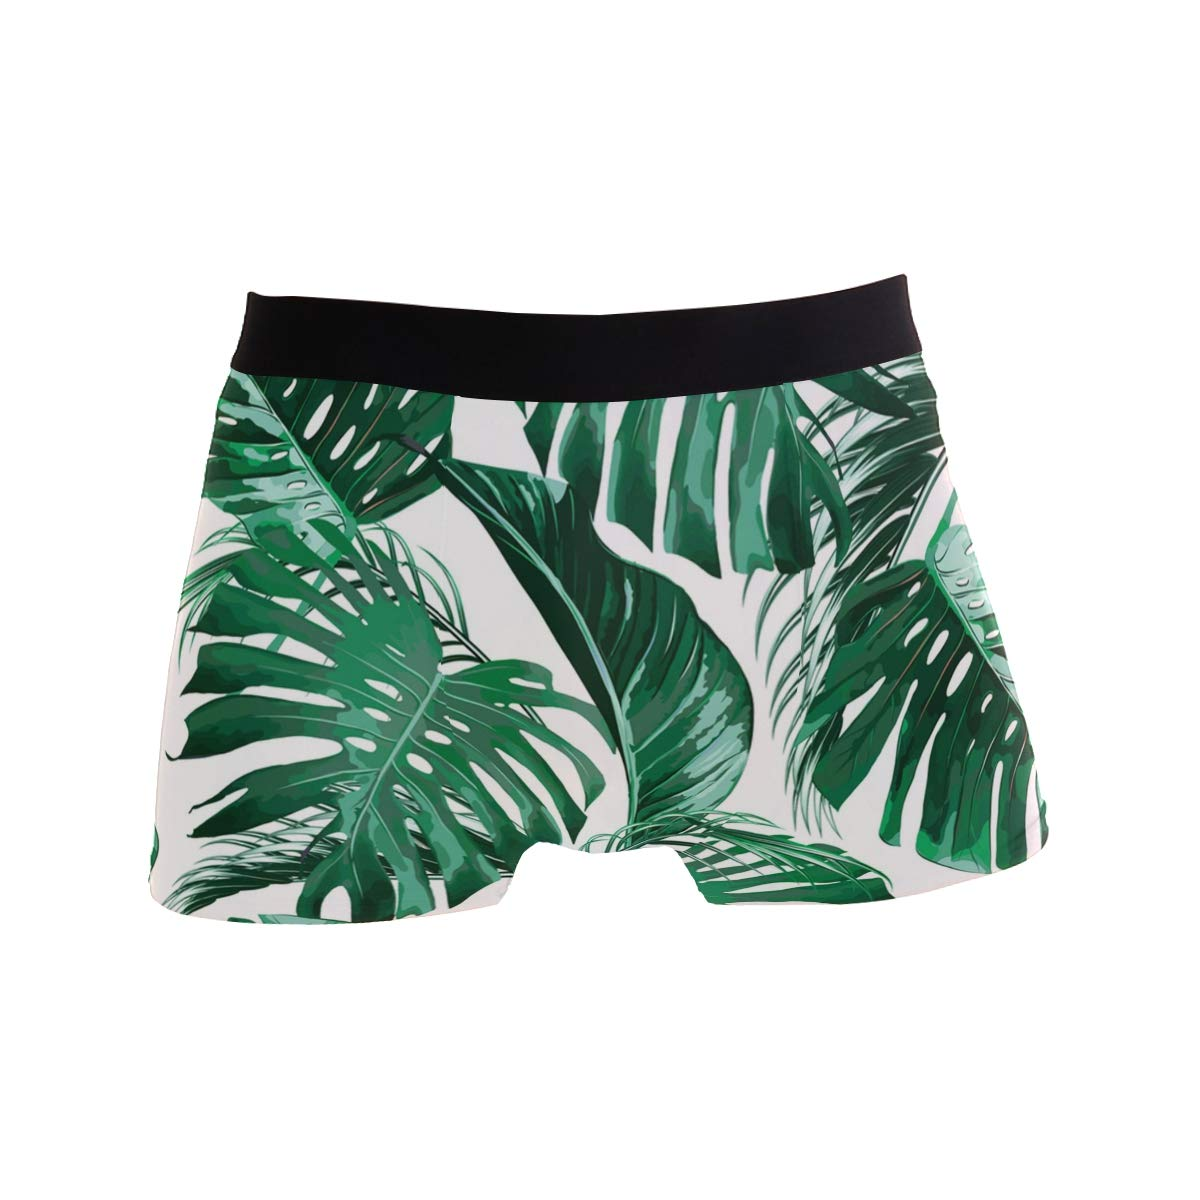 CATSDER Tropical Palm Tree Leaves Jungle Leaf Green Boxer Briefs Mens Underwear Pack Seamless Comfort Soft